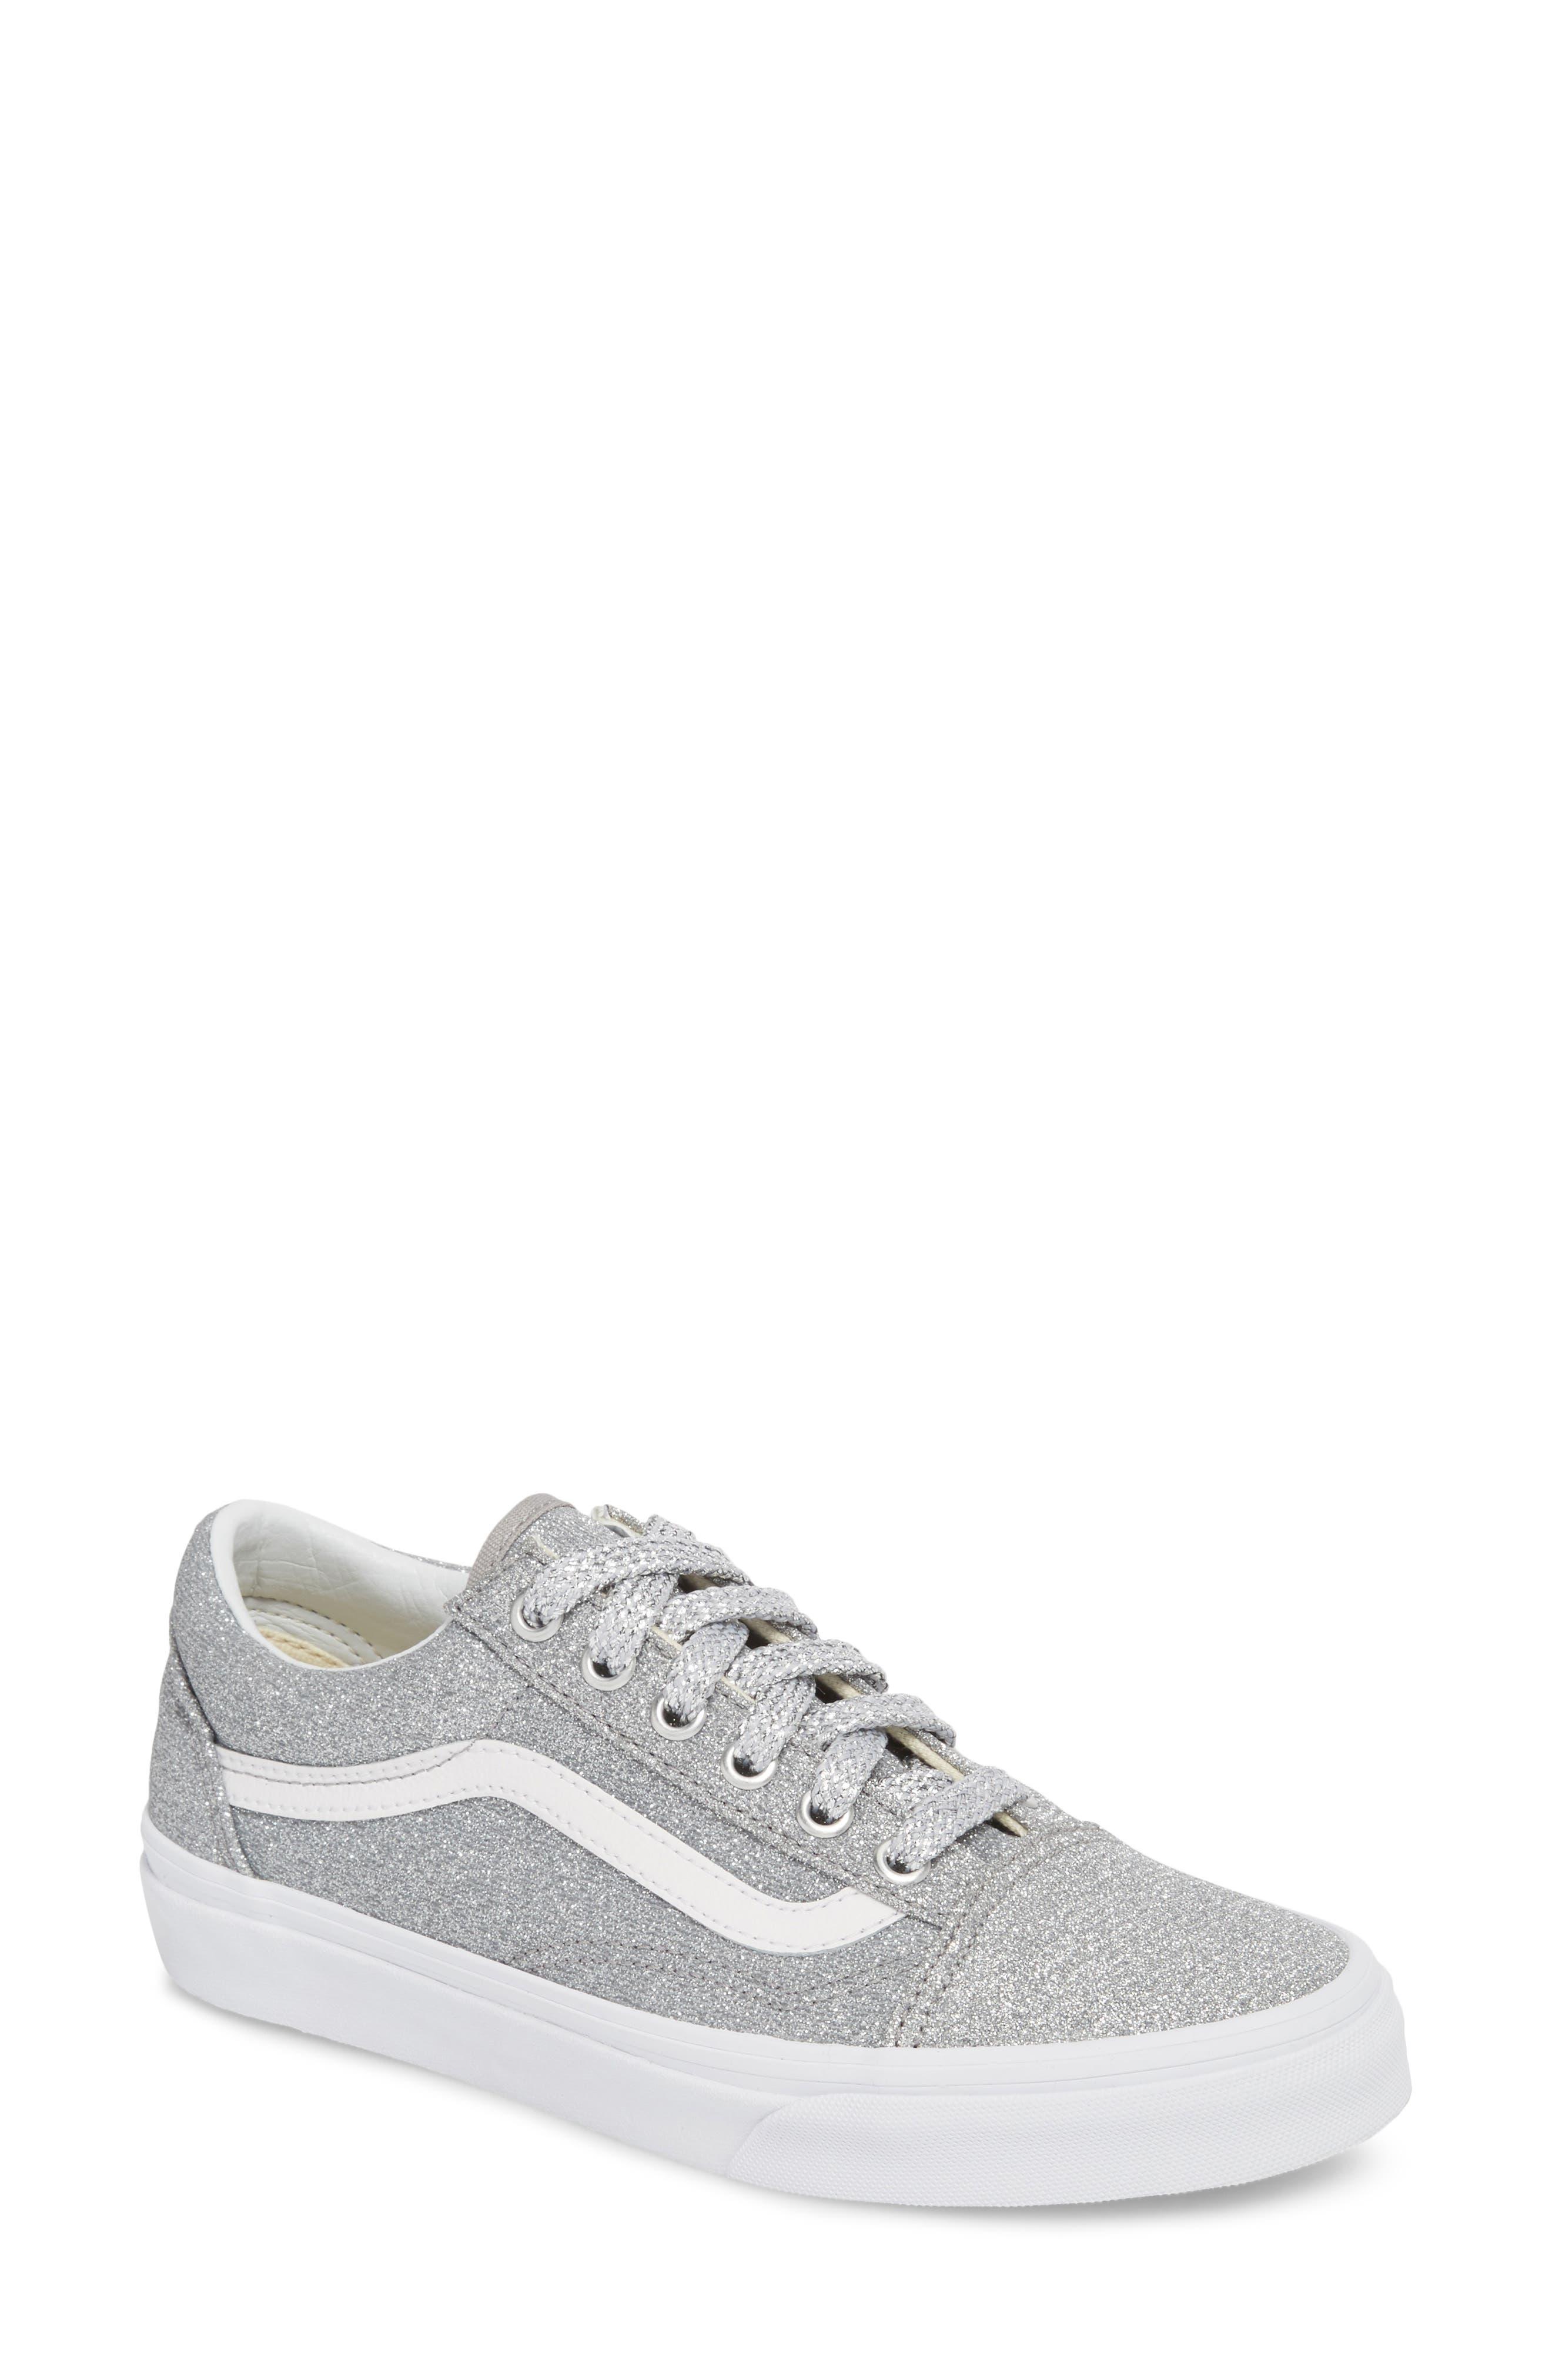 UA Old Skool Glitter Low Top Sneaker,                             Main thumbnail 1, color,                             SILVER/ TRUE WHITE GLITTER